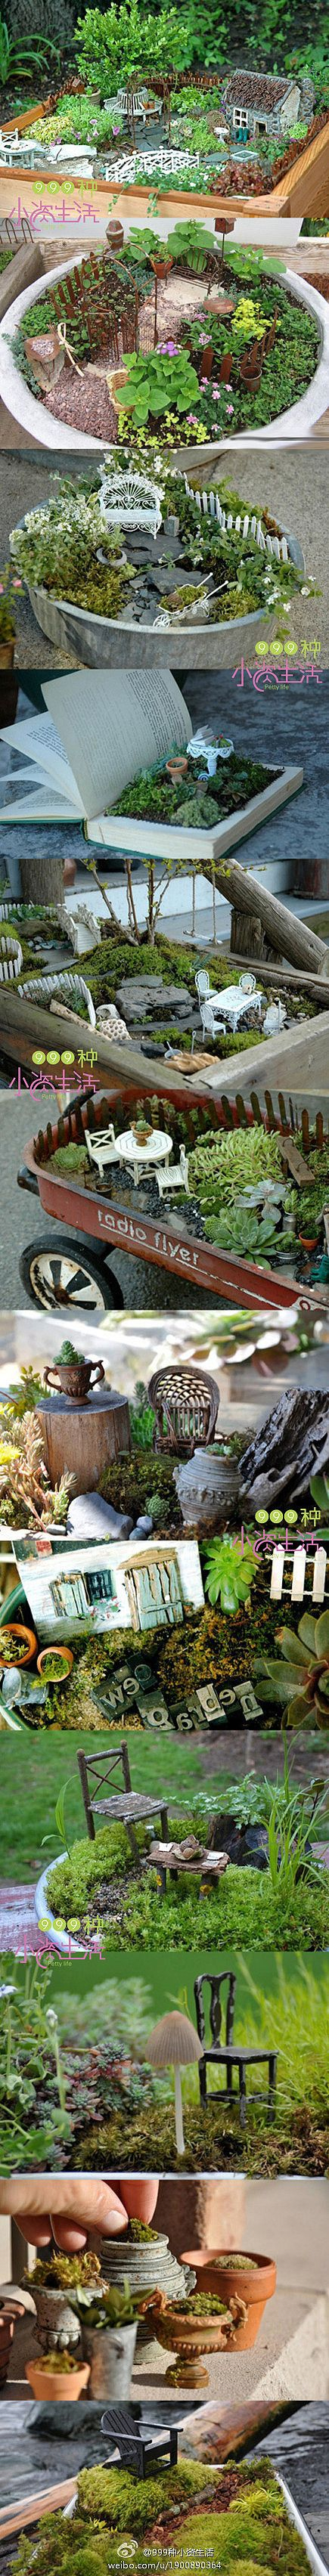 .Fairy Gardens